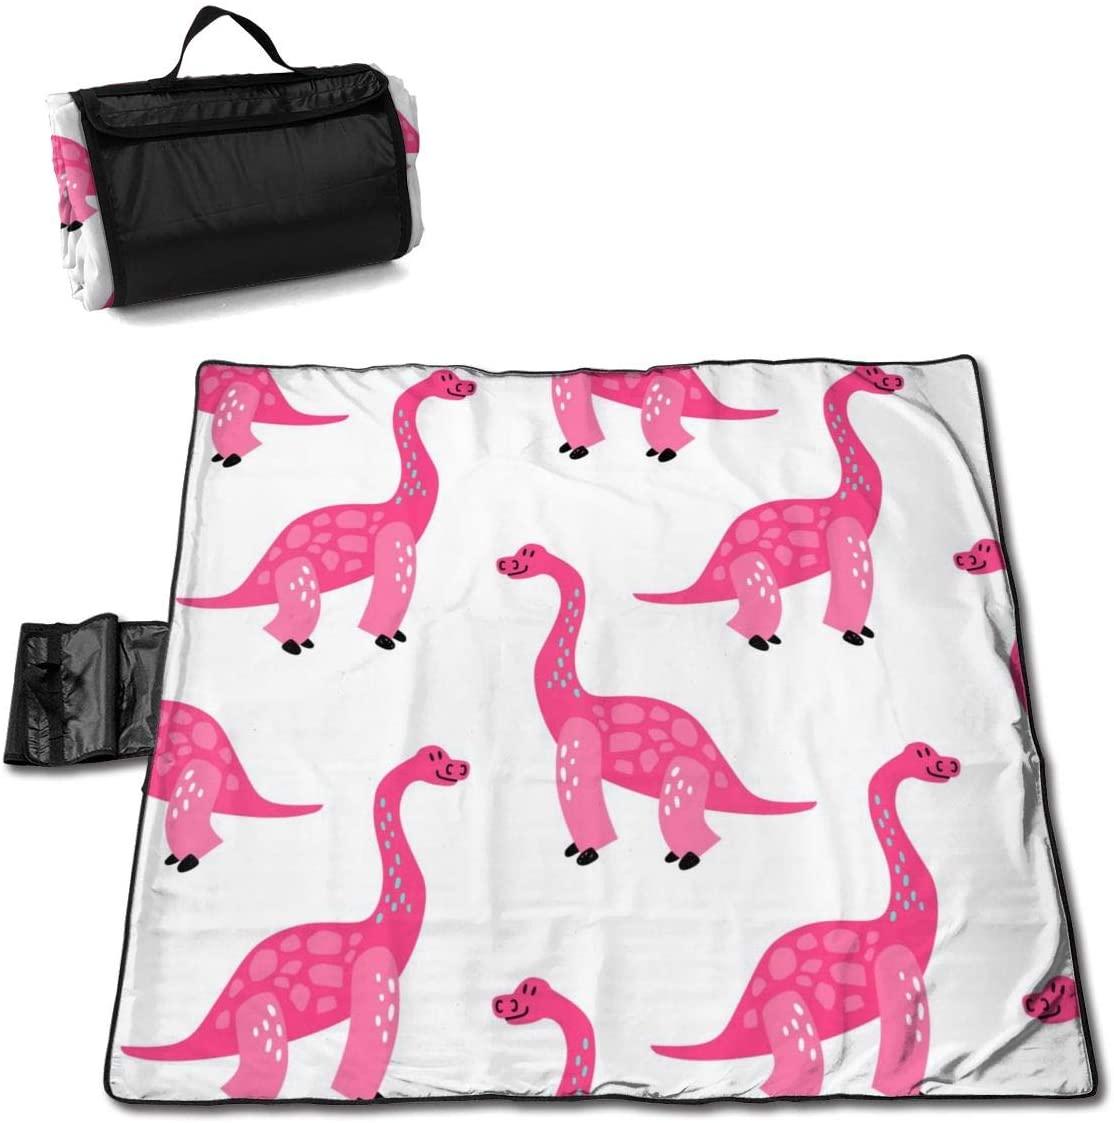 HONGSH Outdoor Picnic Blanket,Beach Blanket, Cute Pink Dinosaurs Beach Mat, Waterproof Sandproof Foldable Picnic Mat, Portable Outdoor Beach Blanket for Beaches,Camping,Hiking Picnic